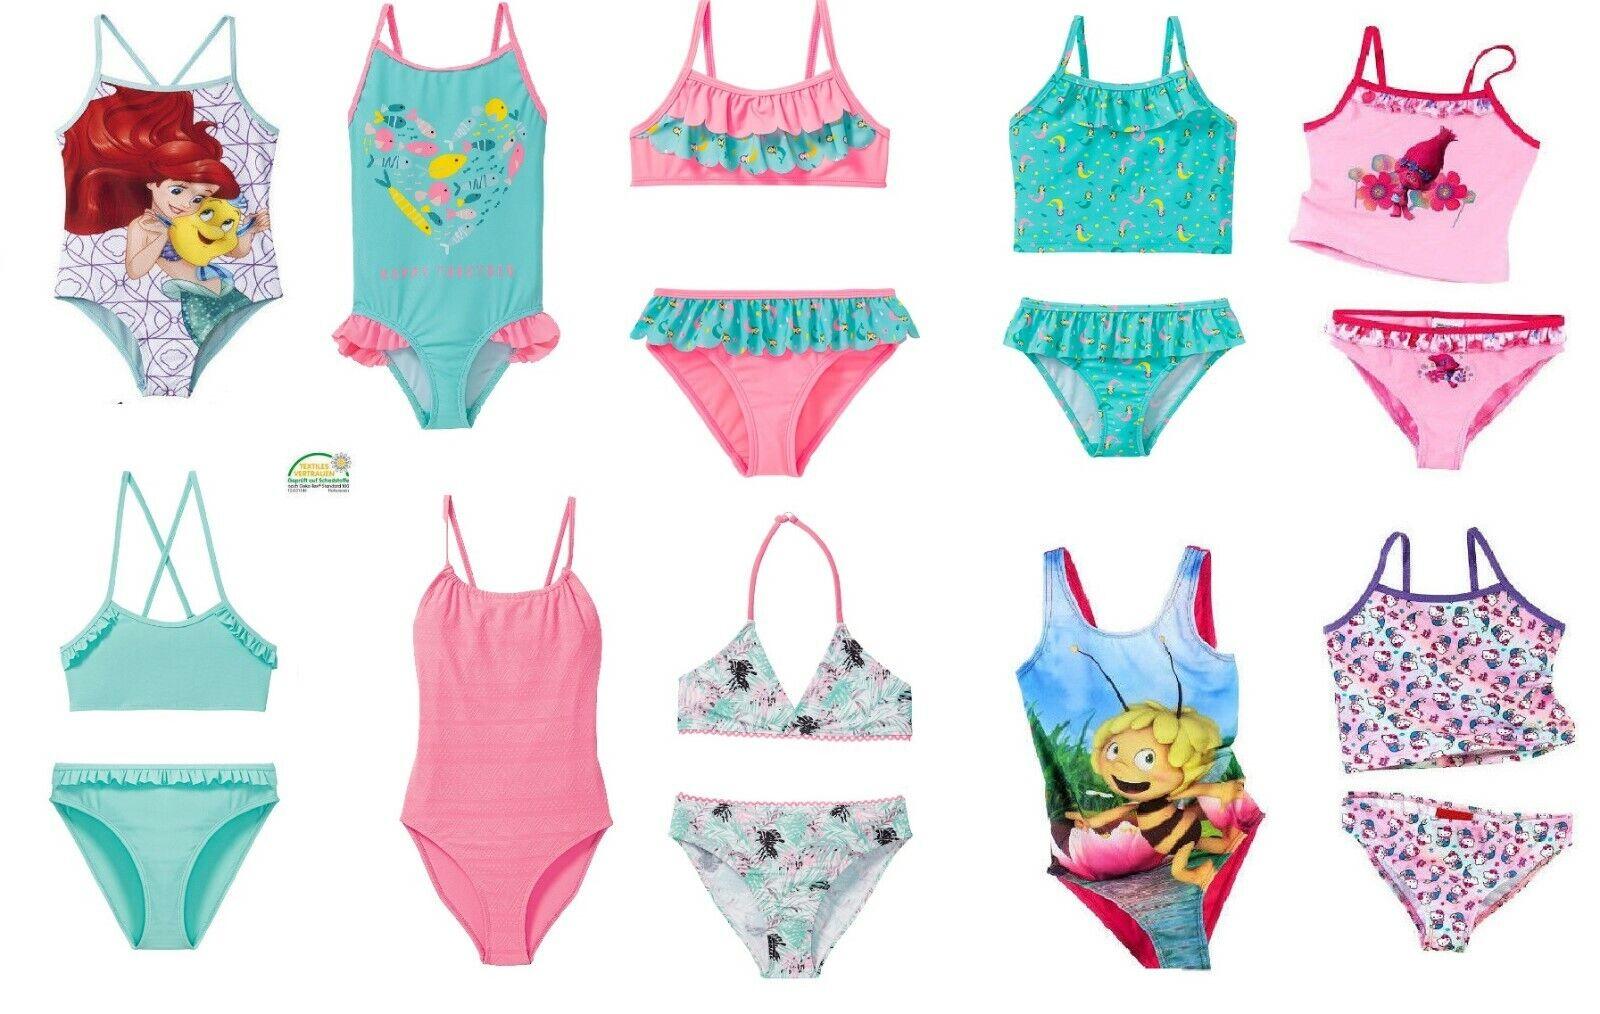 Mädche  Kinder Badeanzug Bikini Set Frozen Maja Trolls Hello Kitty auswahl